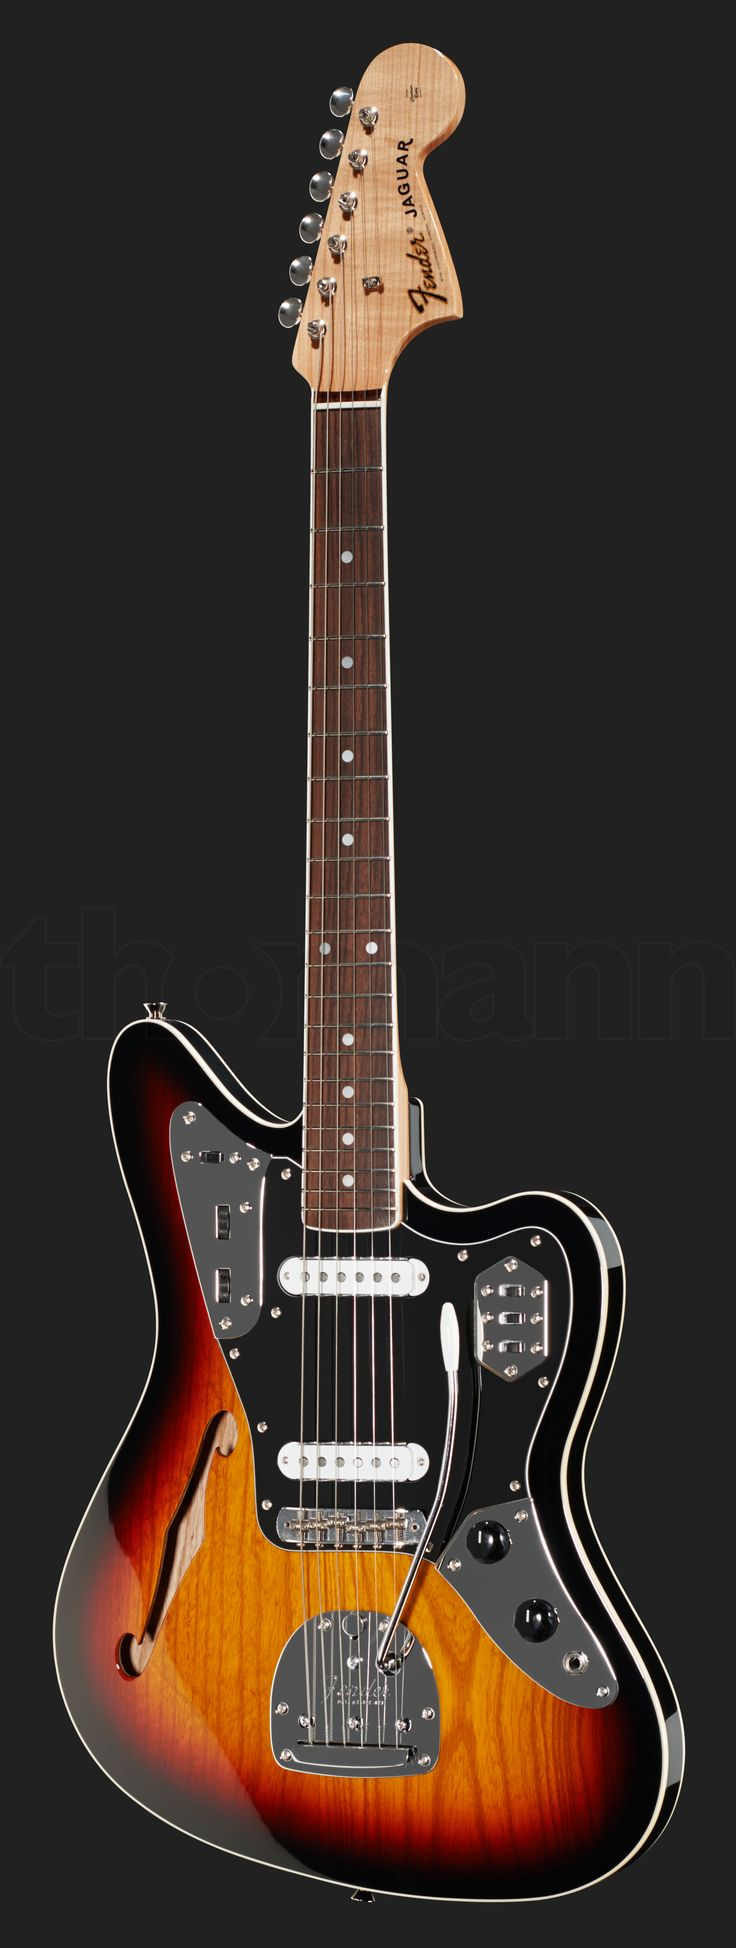 Fender Jaguar Thinline SB